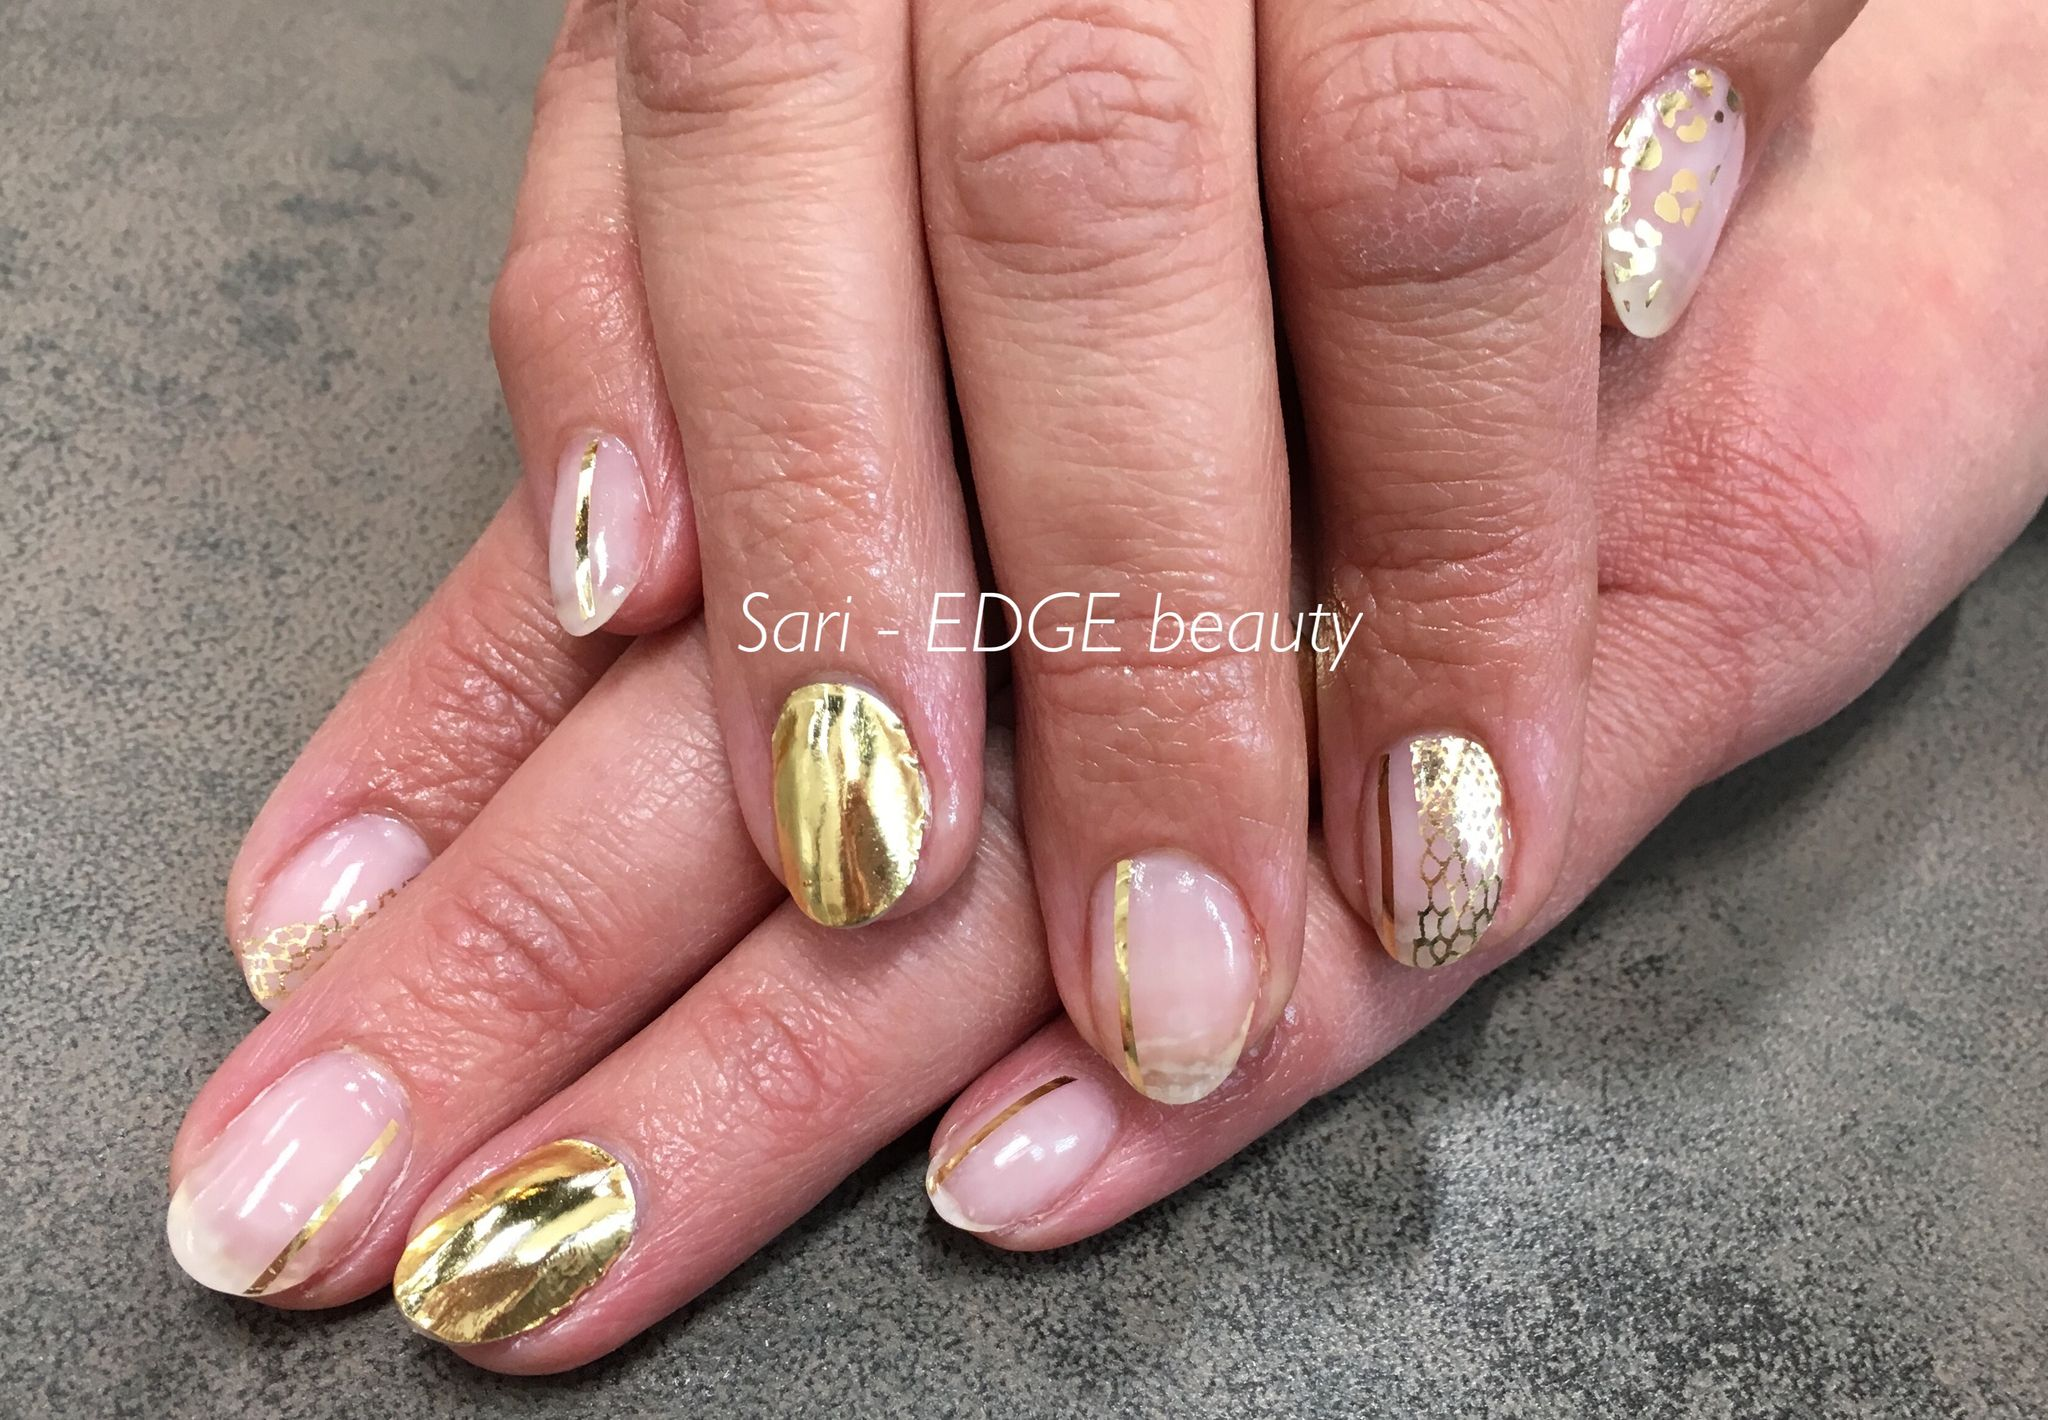 Minxy artistic nail design educator u certified ibx system